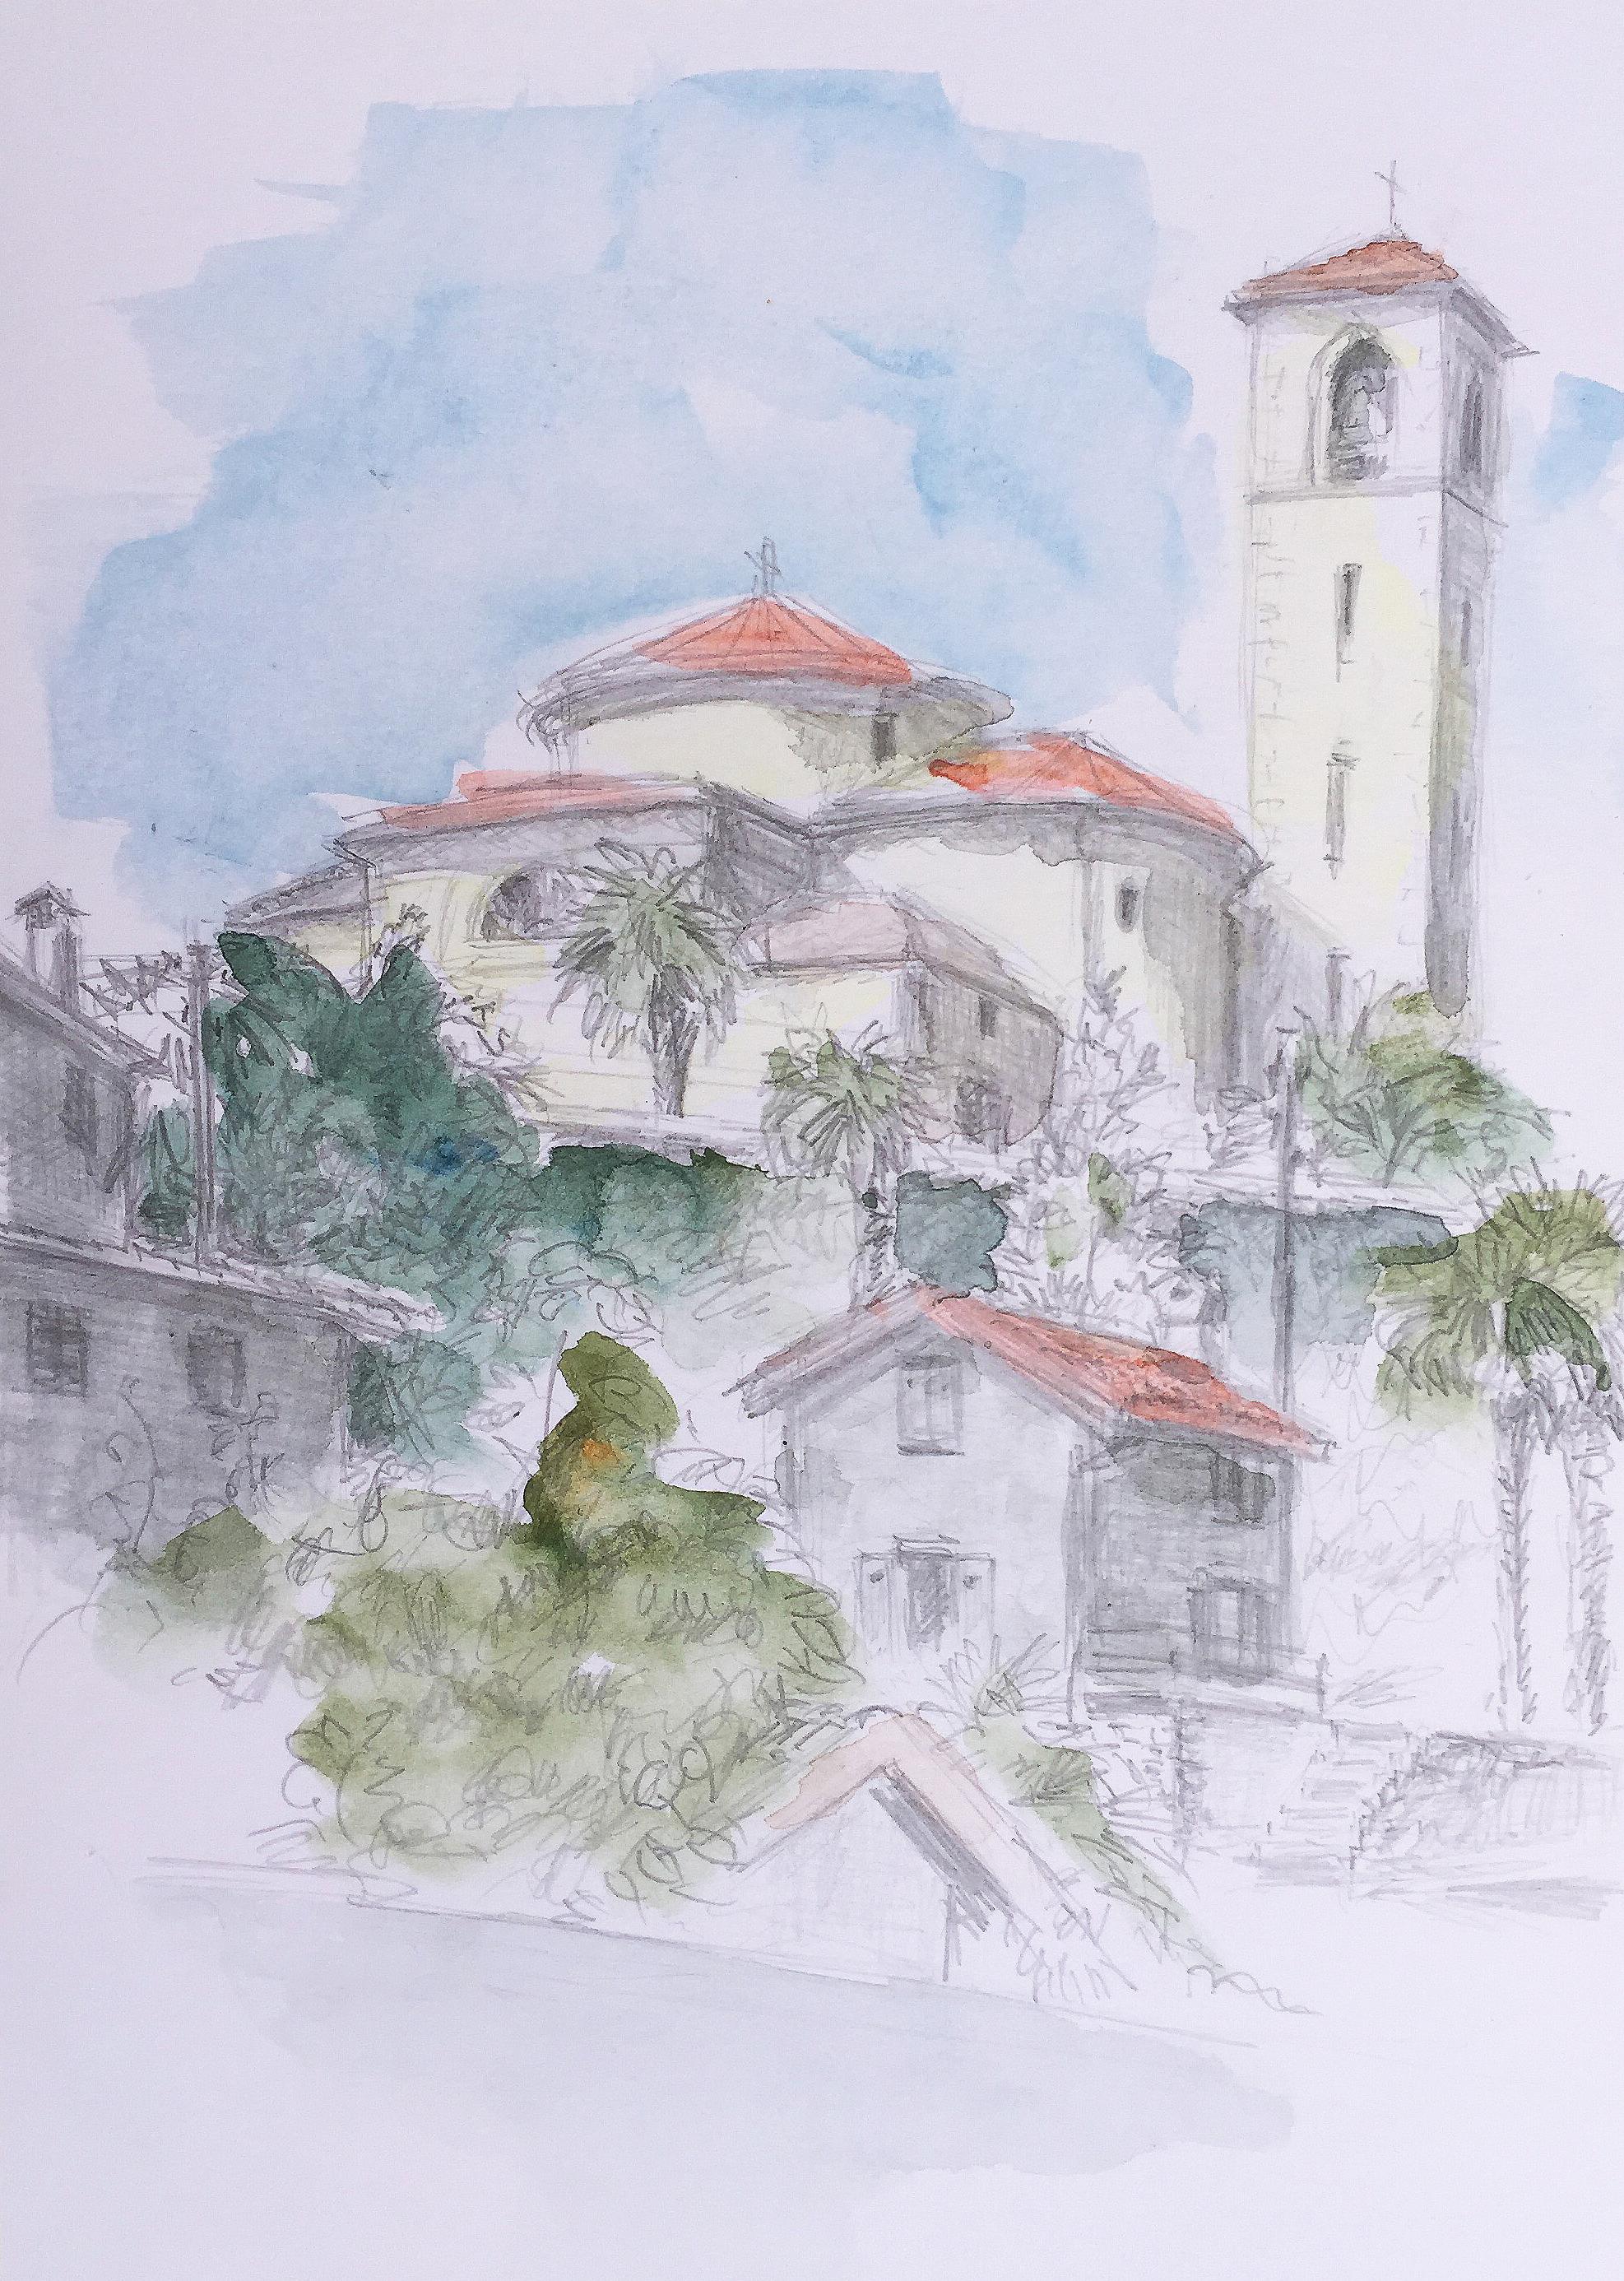 St Abbondio_13.9.18_Aquarell Esthi Birchmeier